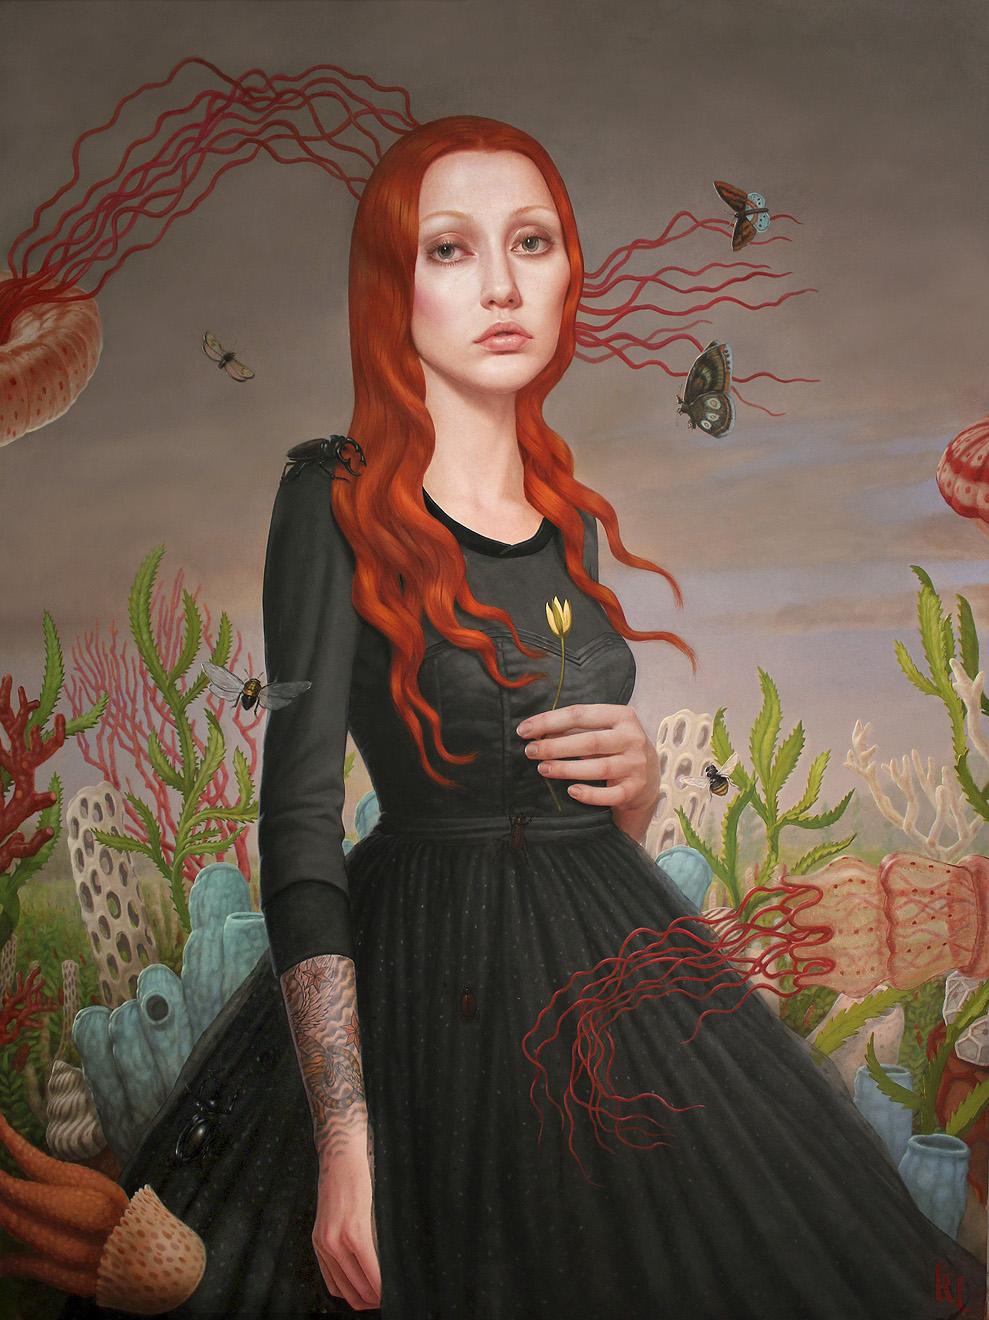 Pintura al oleo de una mujer tatuada entre naturaleza po Kris lewis